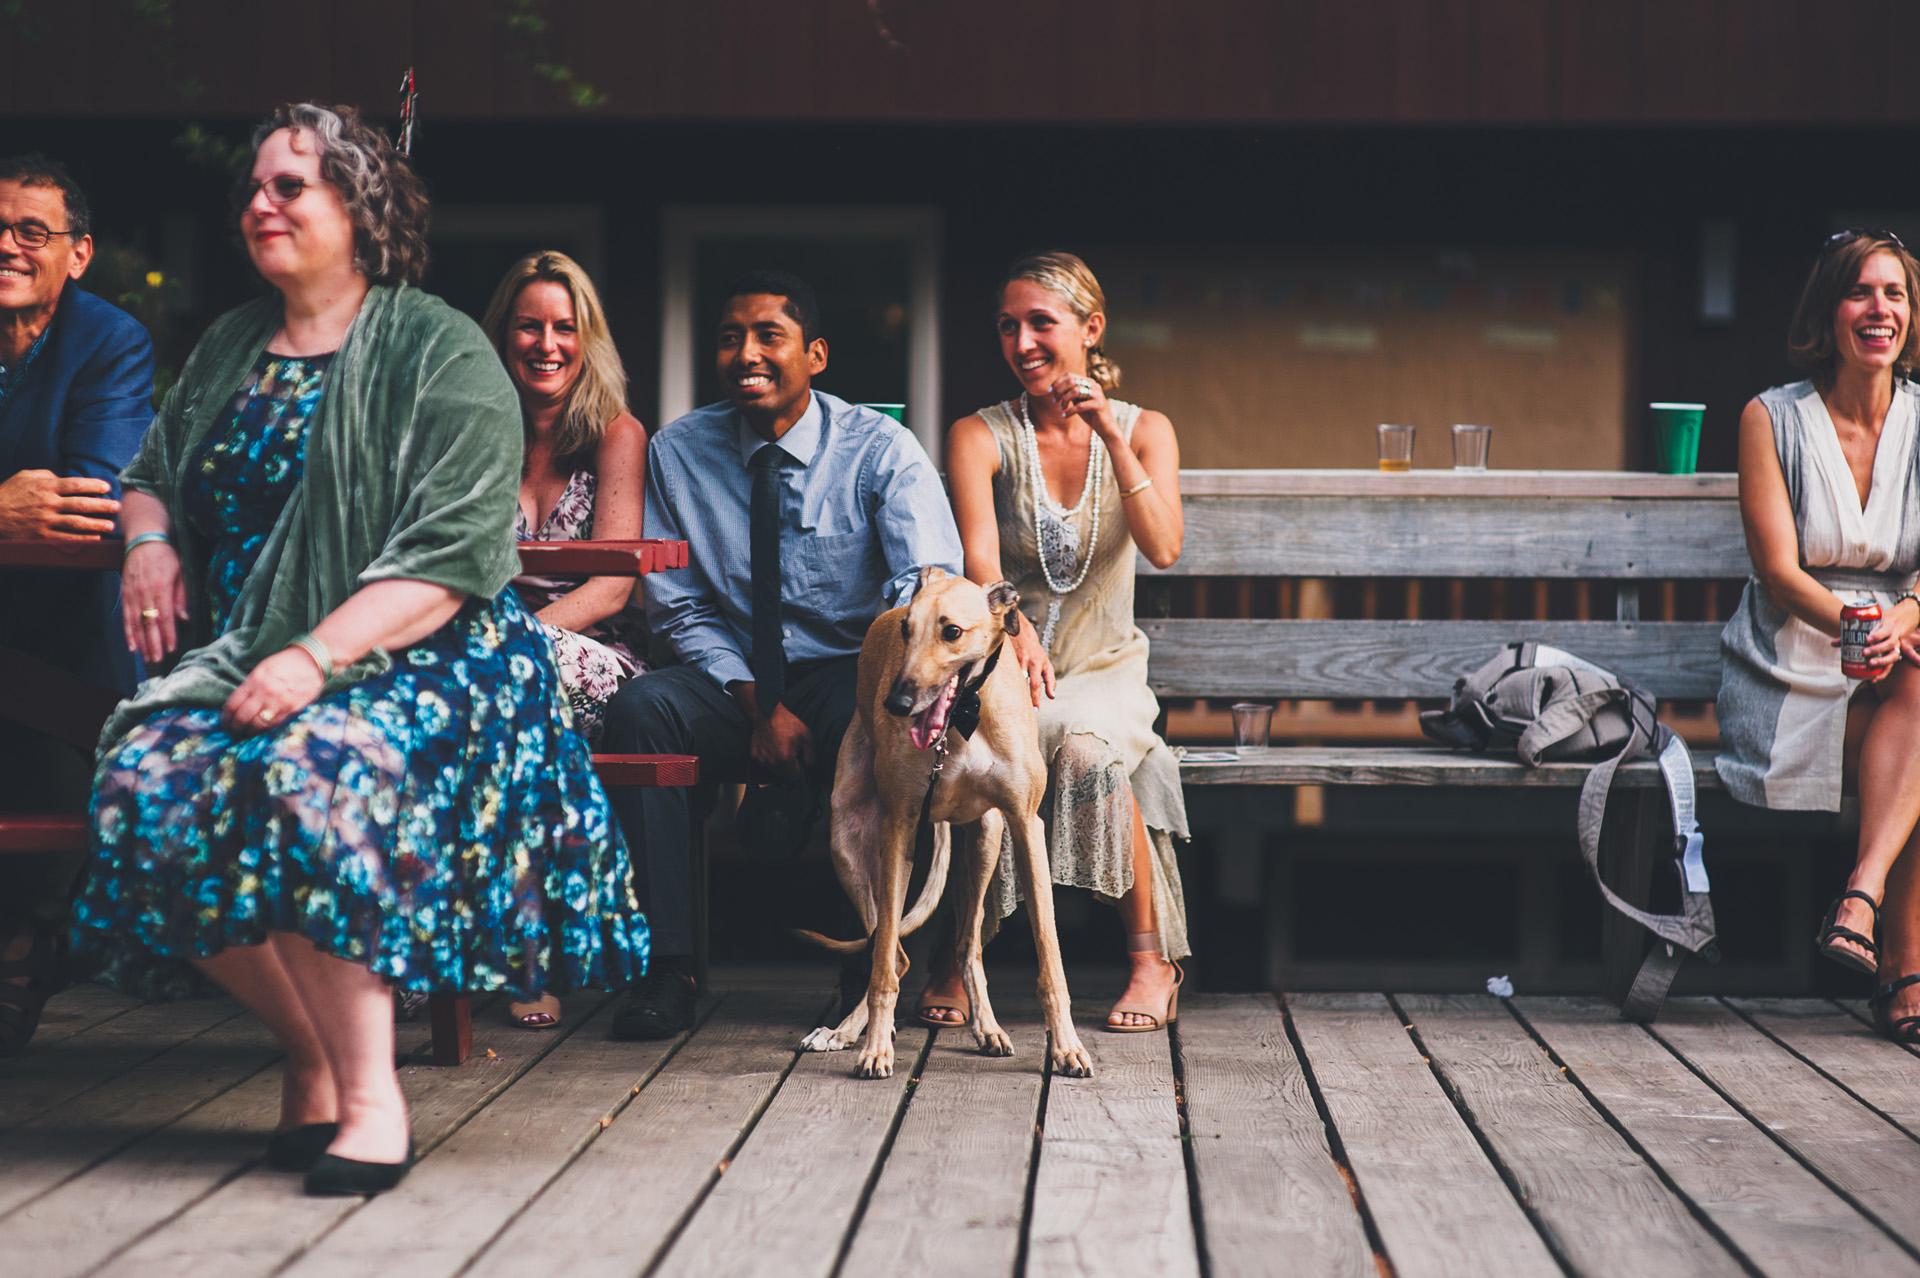 windsor-mountain-summer-camp-wedding-429